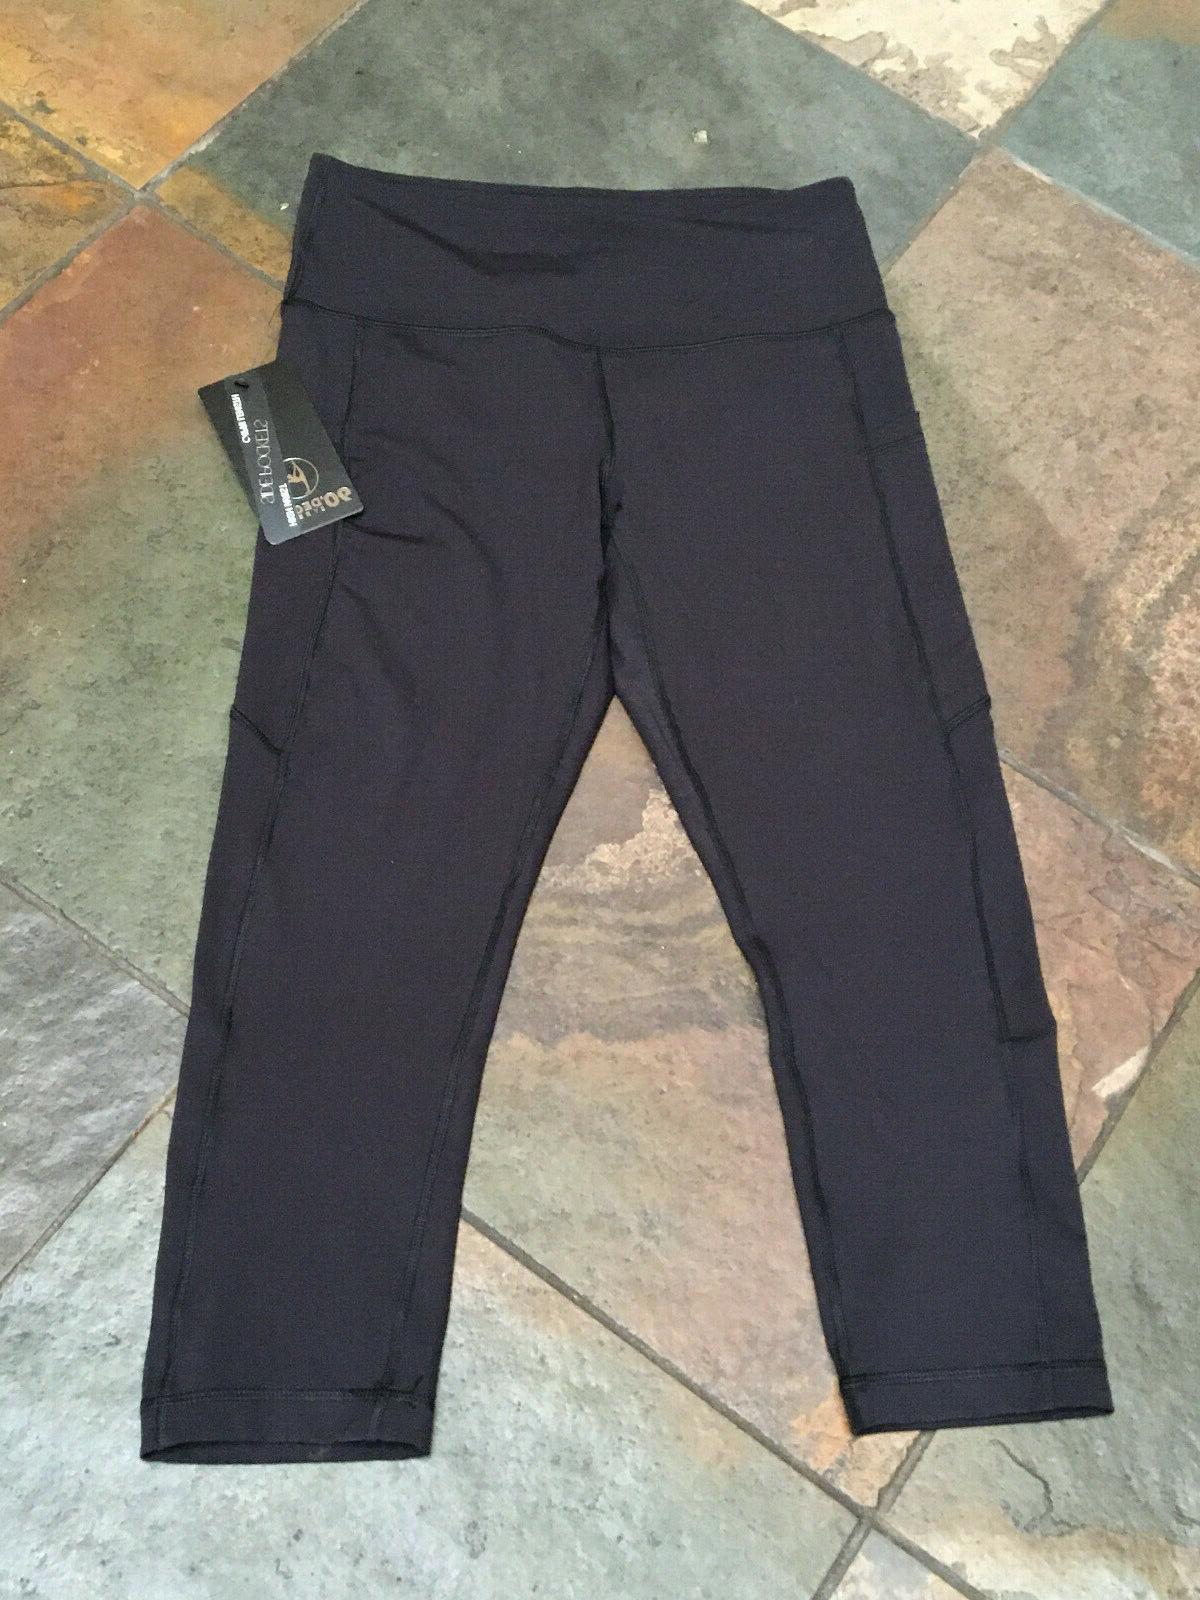 0920 90 degree by reflex large legging